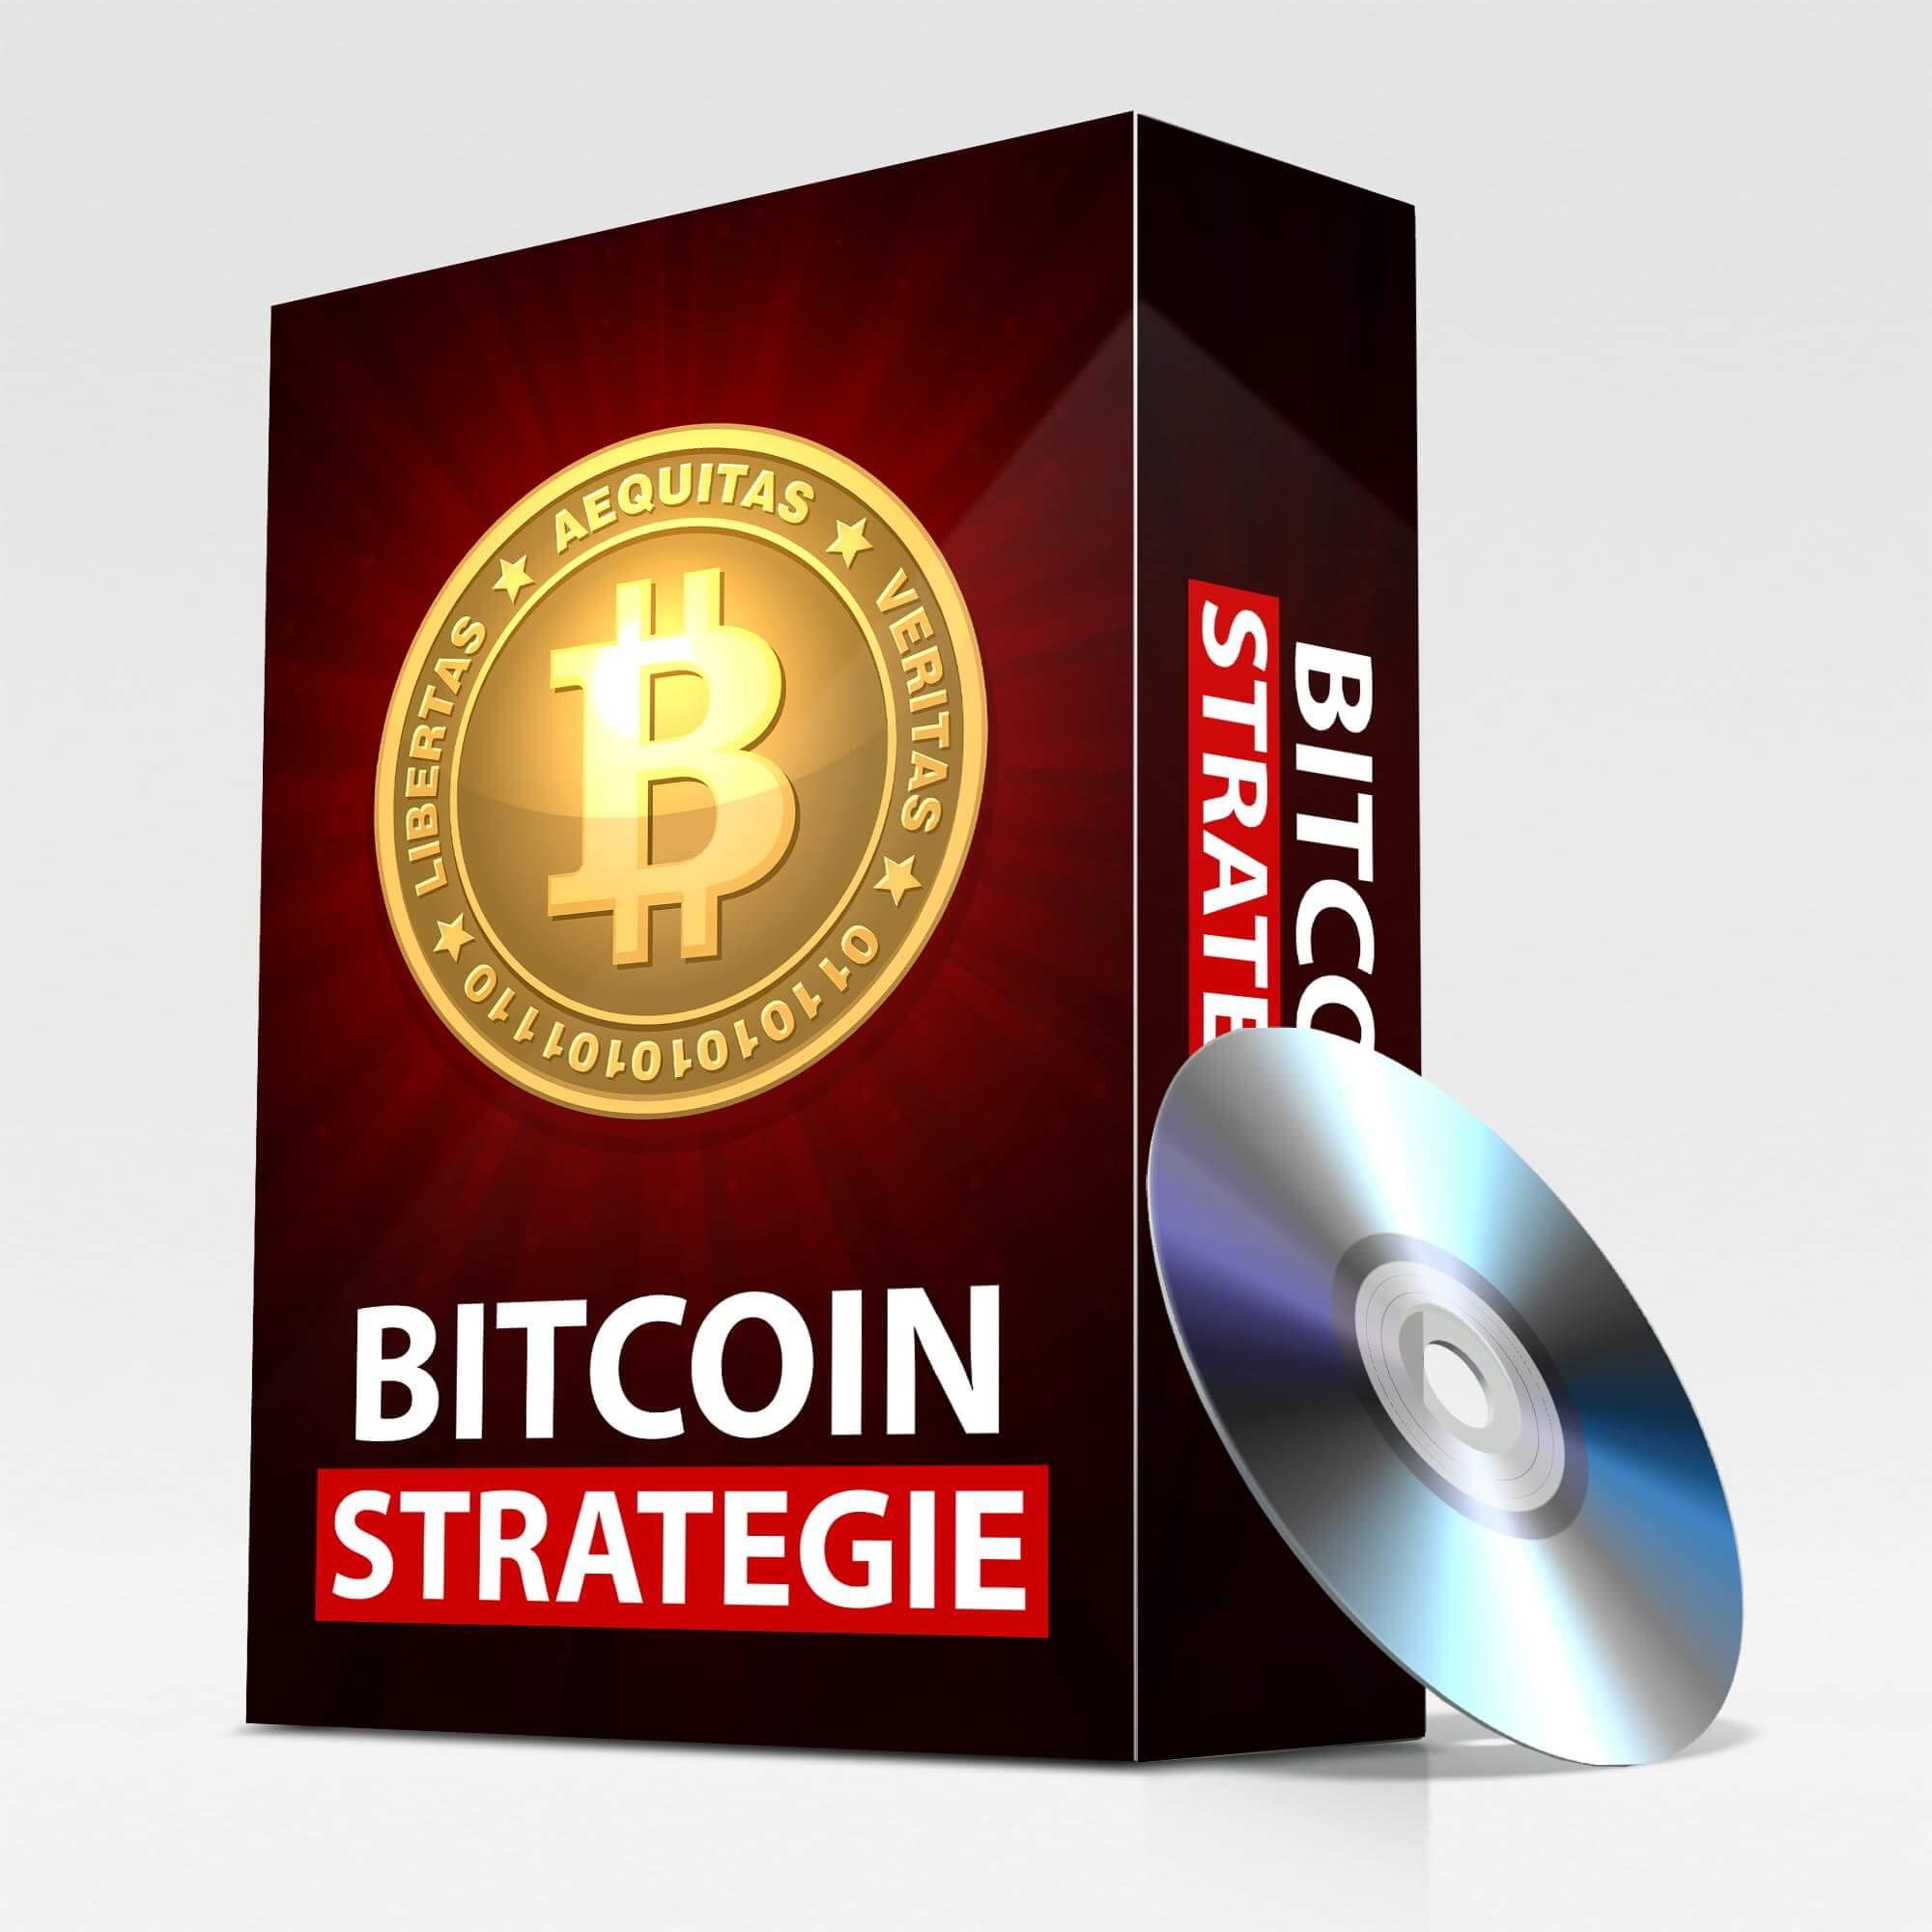 Onlinekurs Bitcoin Strategie